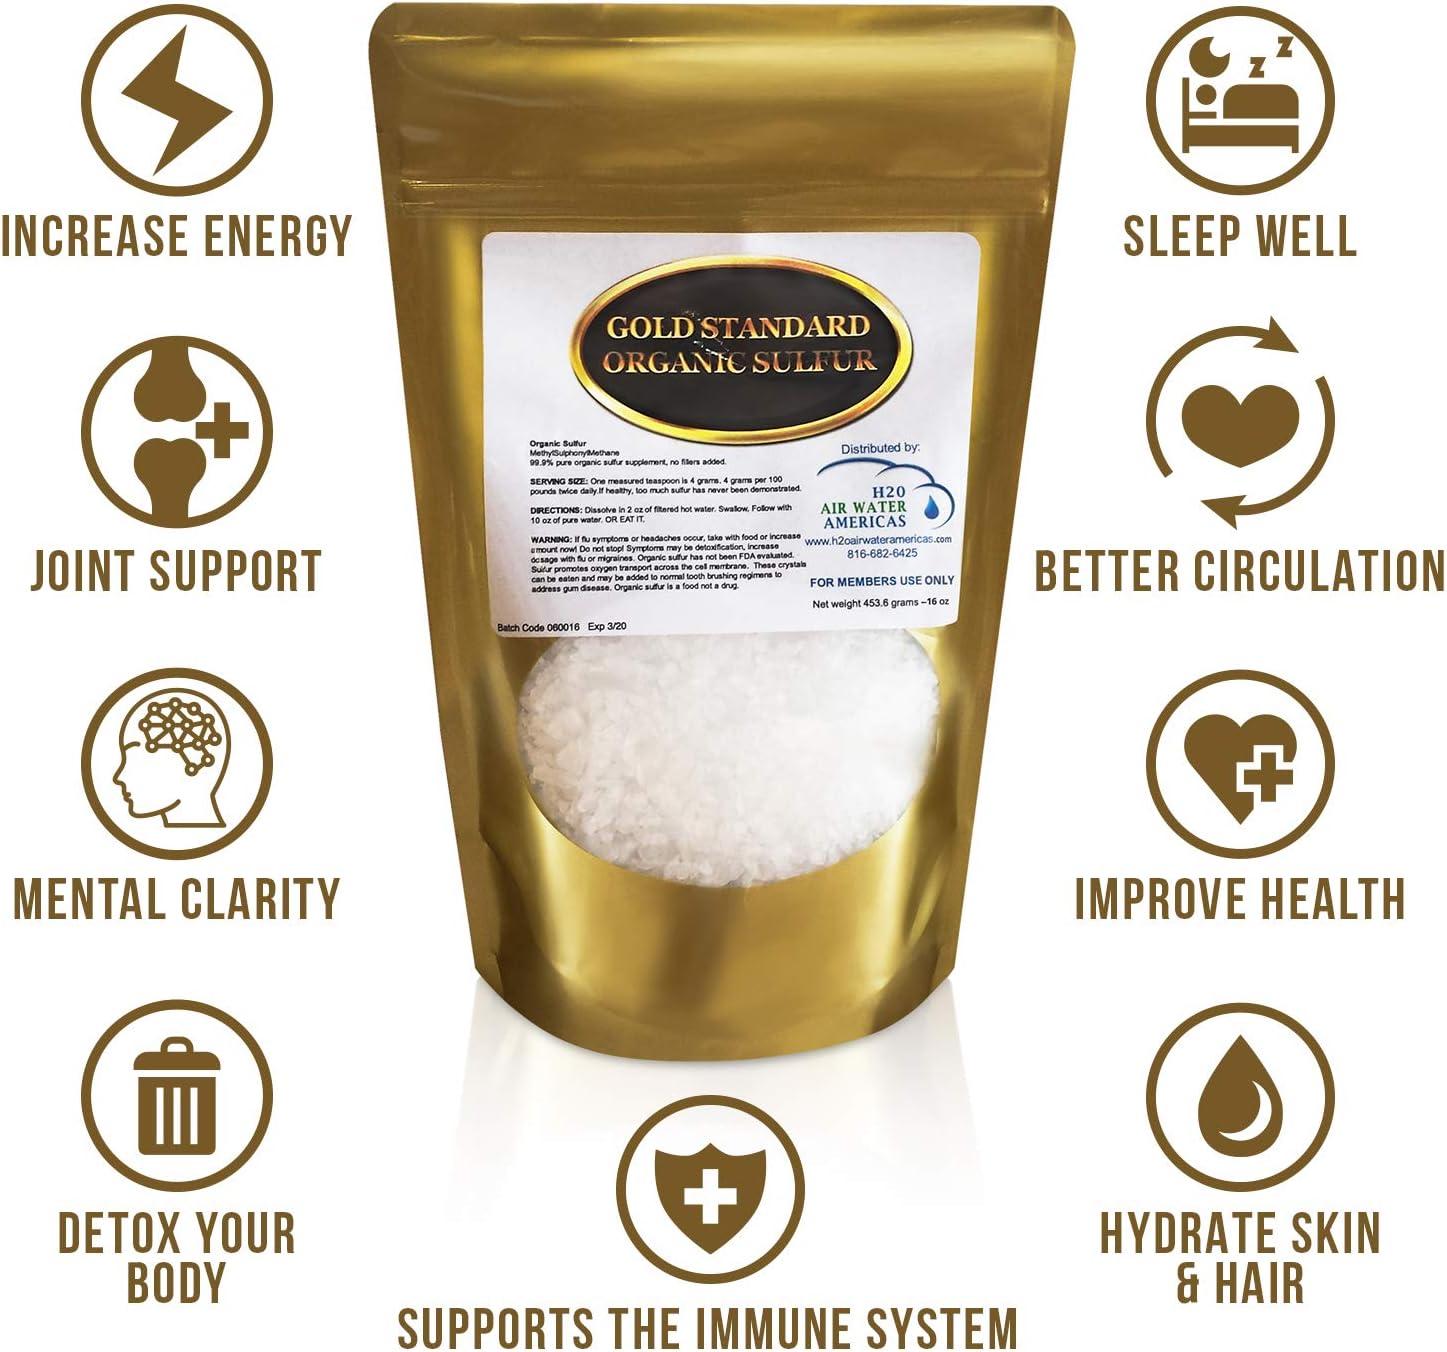 Organic Sulphur Granulated OR Sulphur Powder Quality 50g